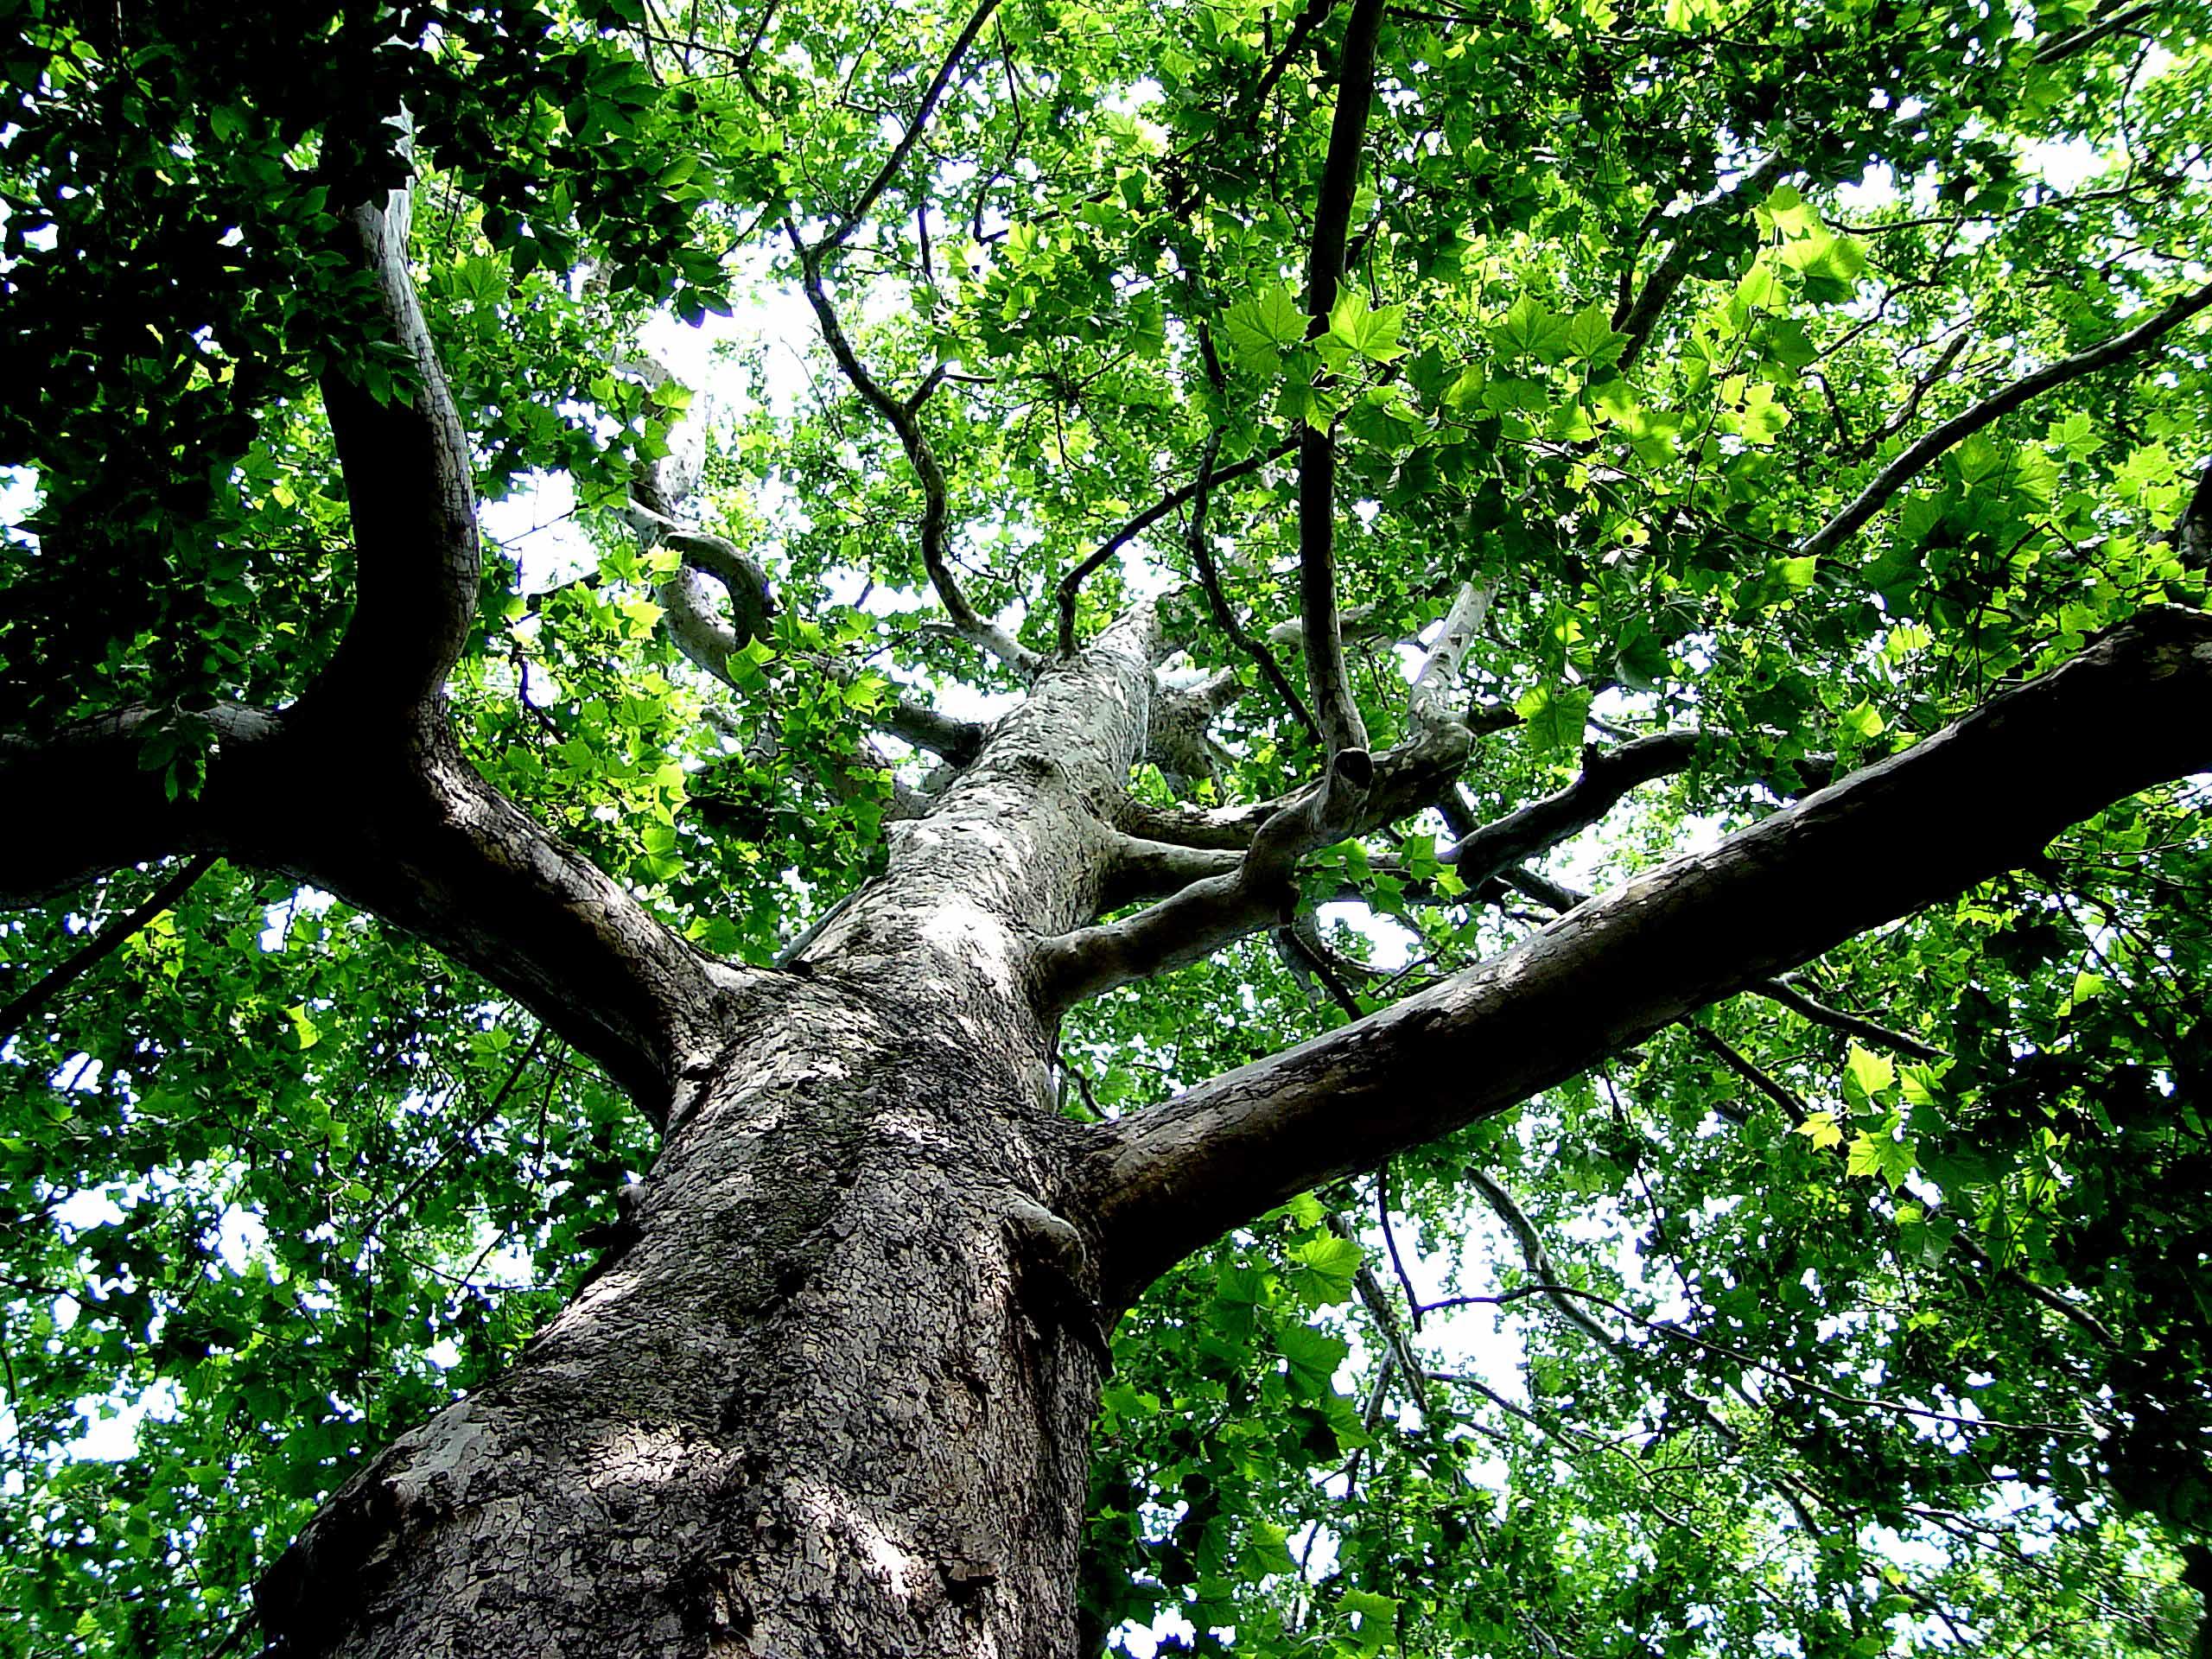 Storslaget träd